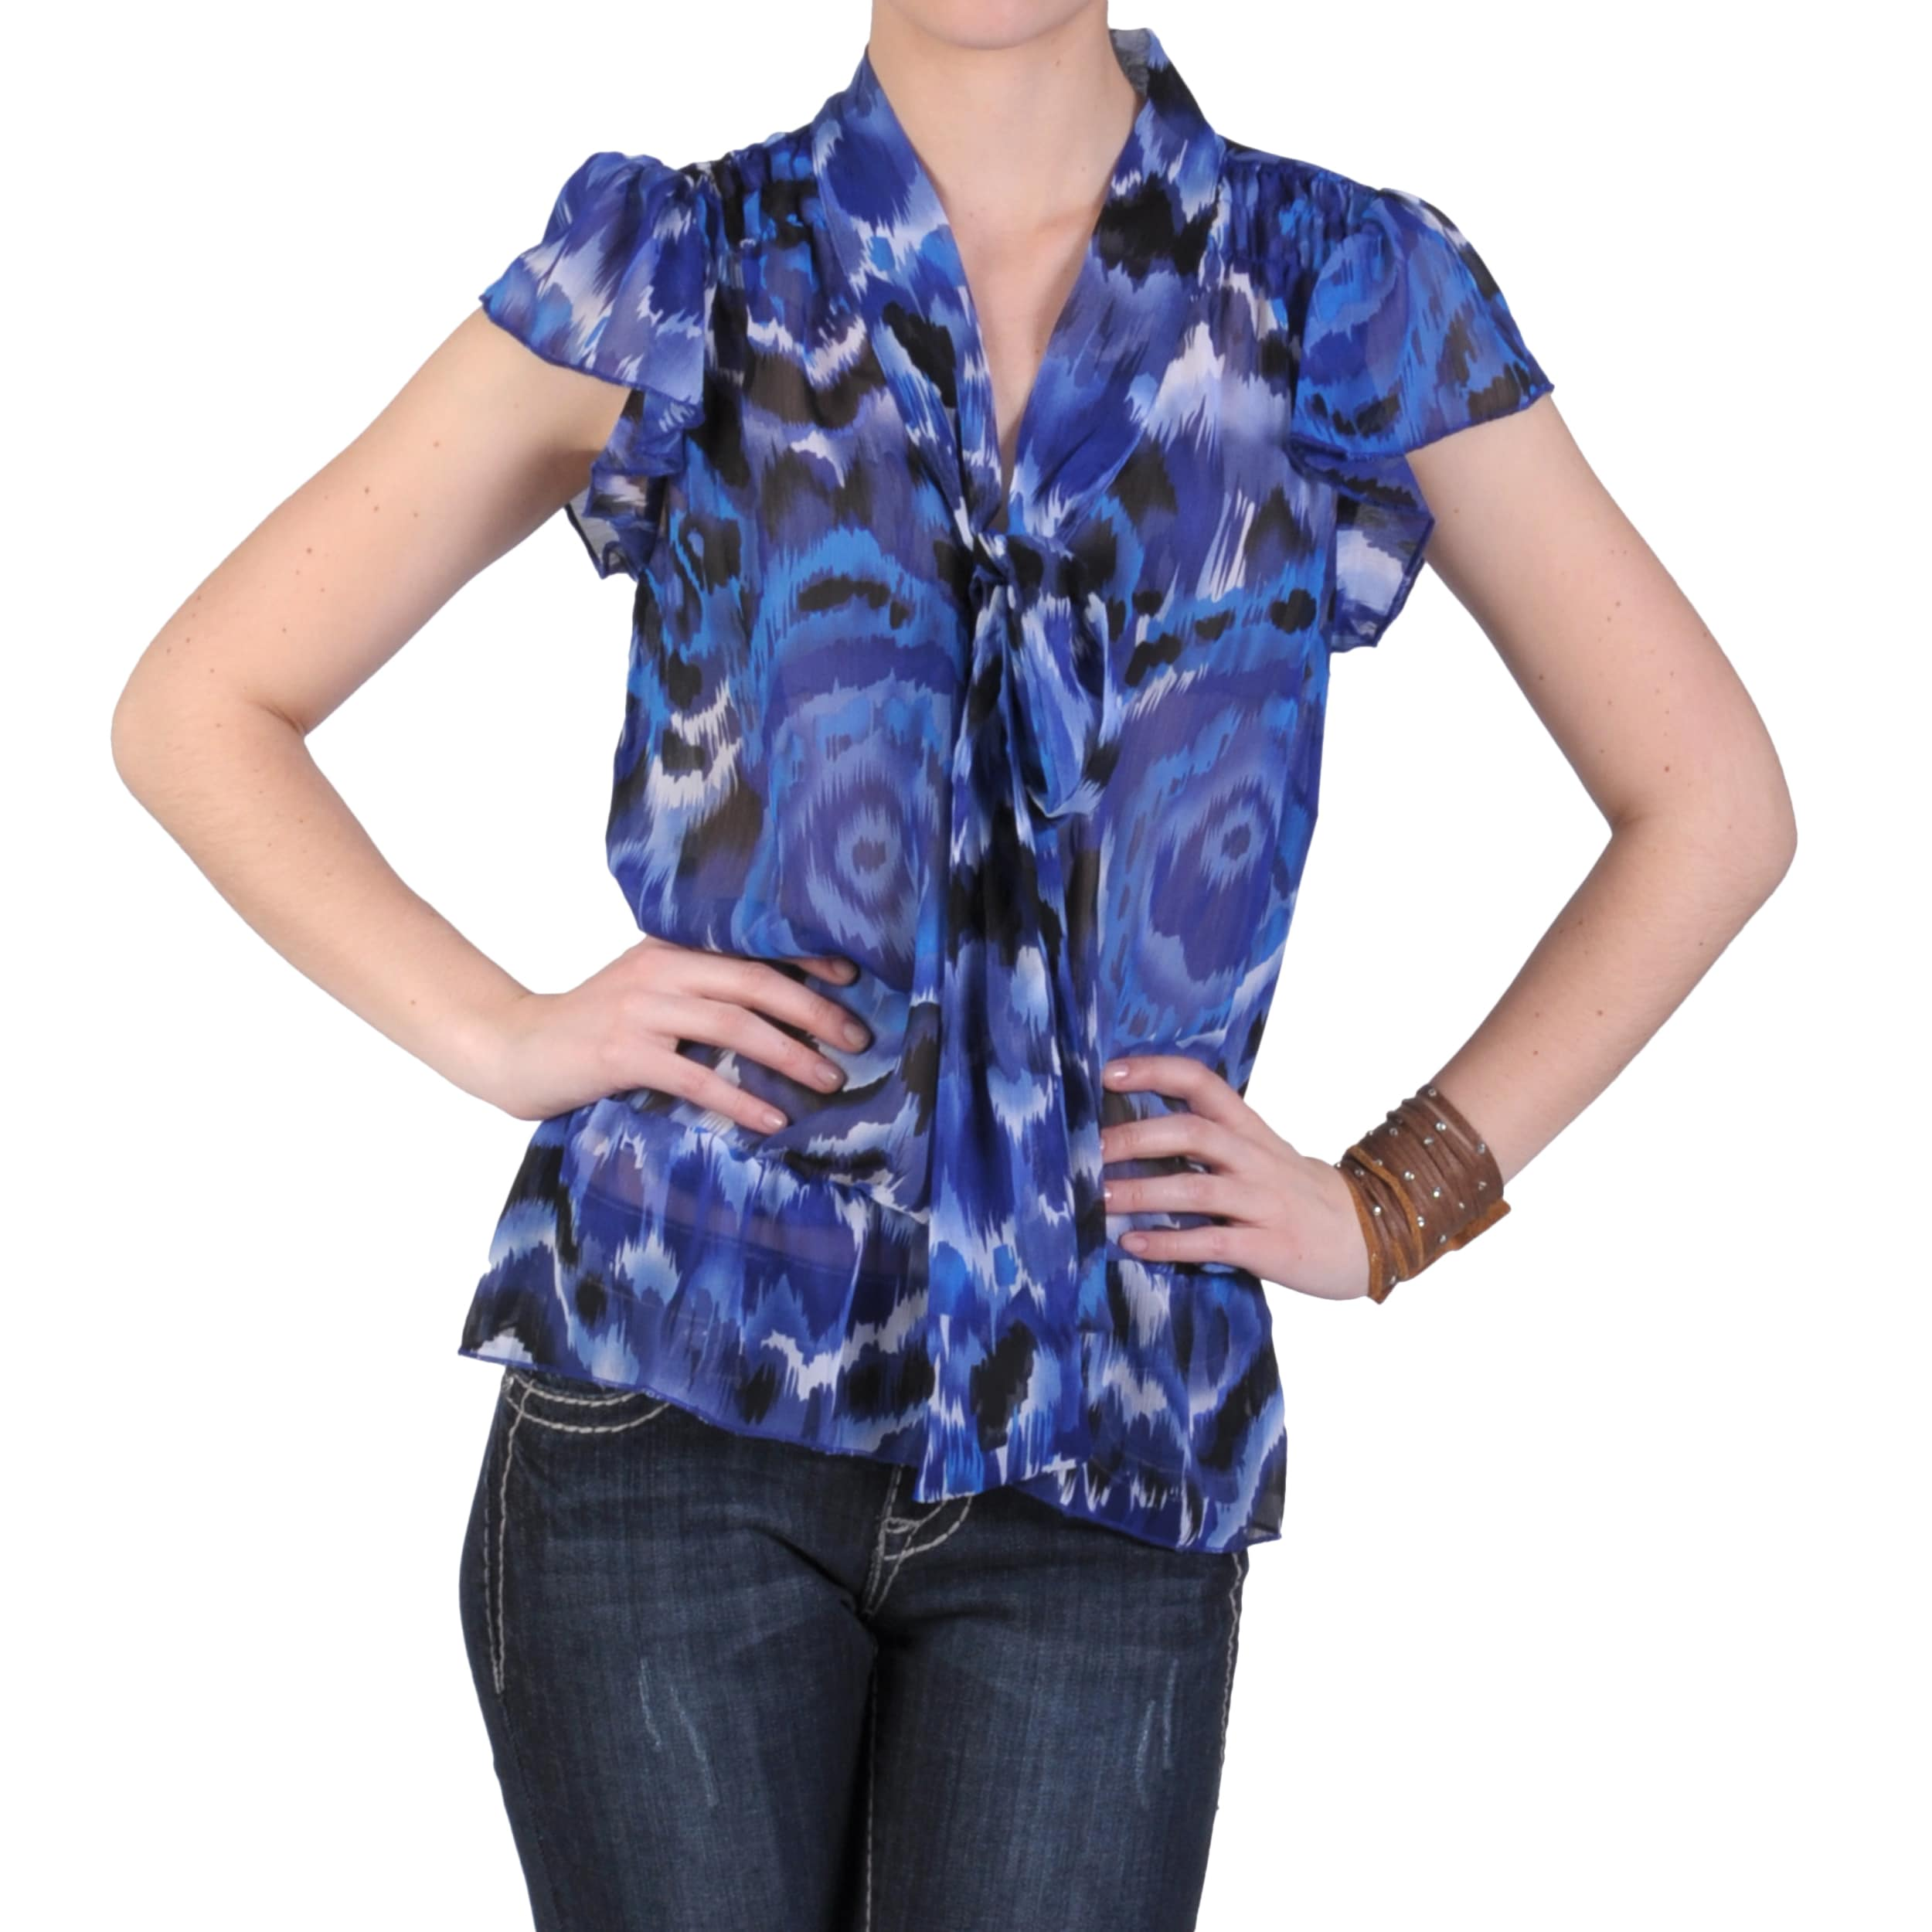 Journee Collection Junior's Short-sleeve V-neck Chiffon Top